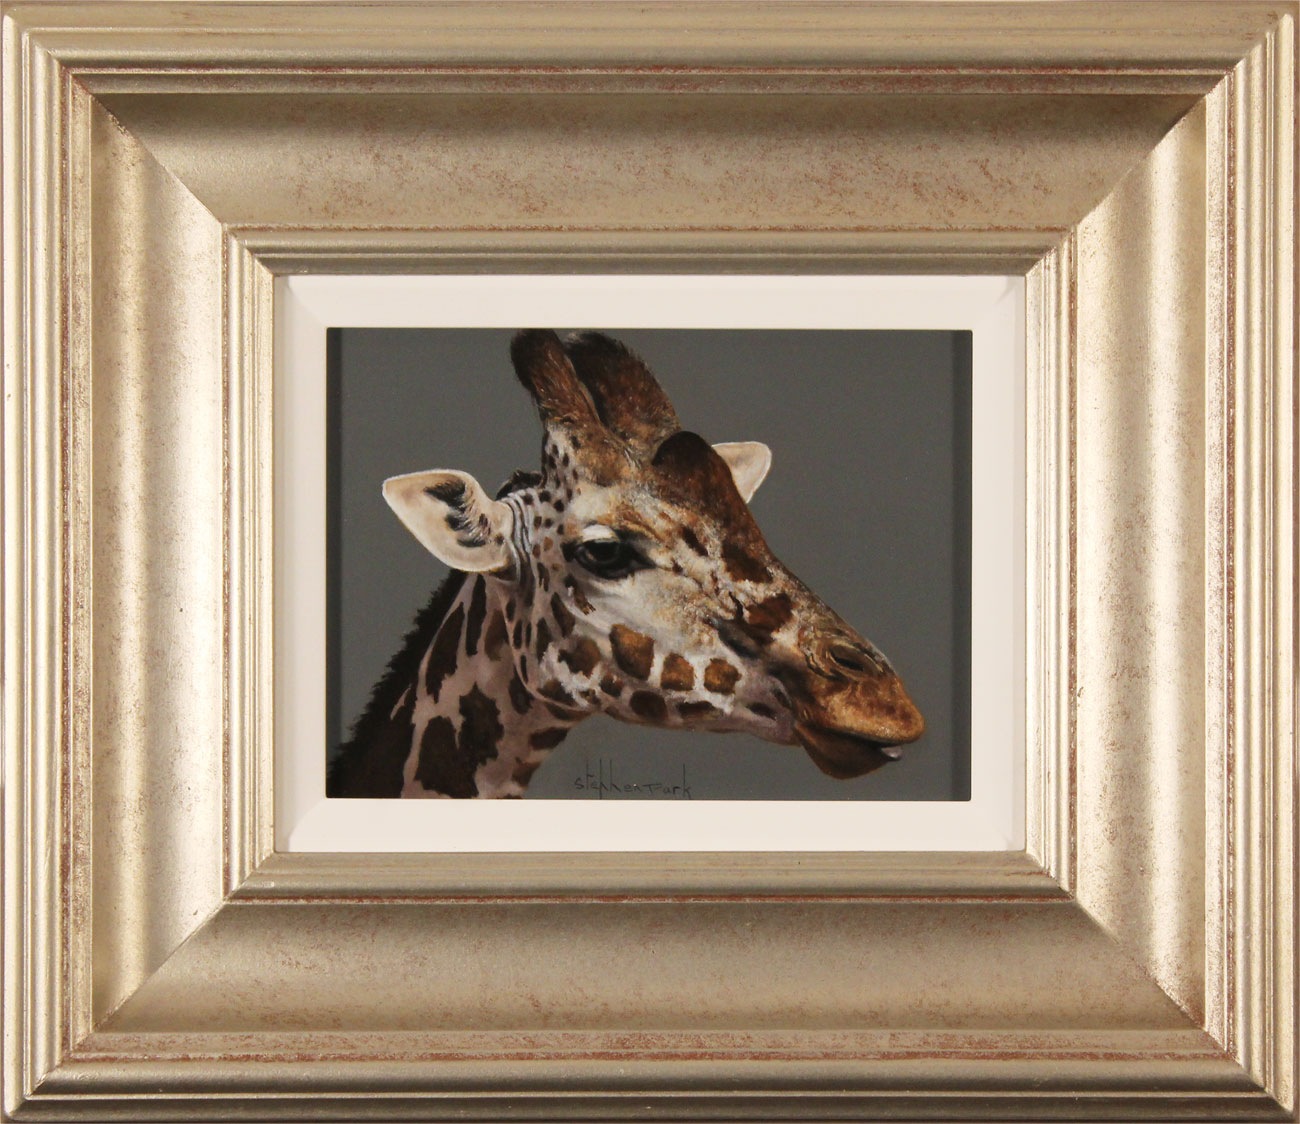 Stephen Park, Original oil painting on panel, Giraffe. Click to enlarge